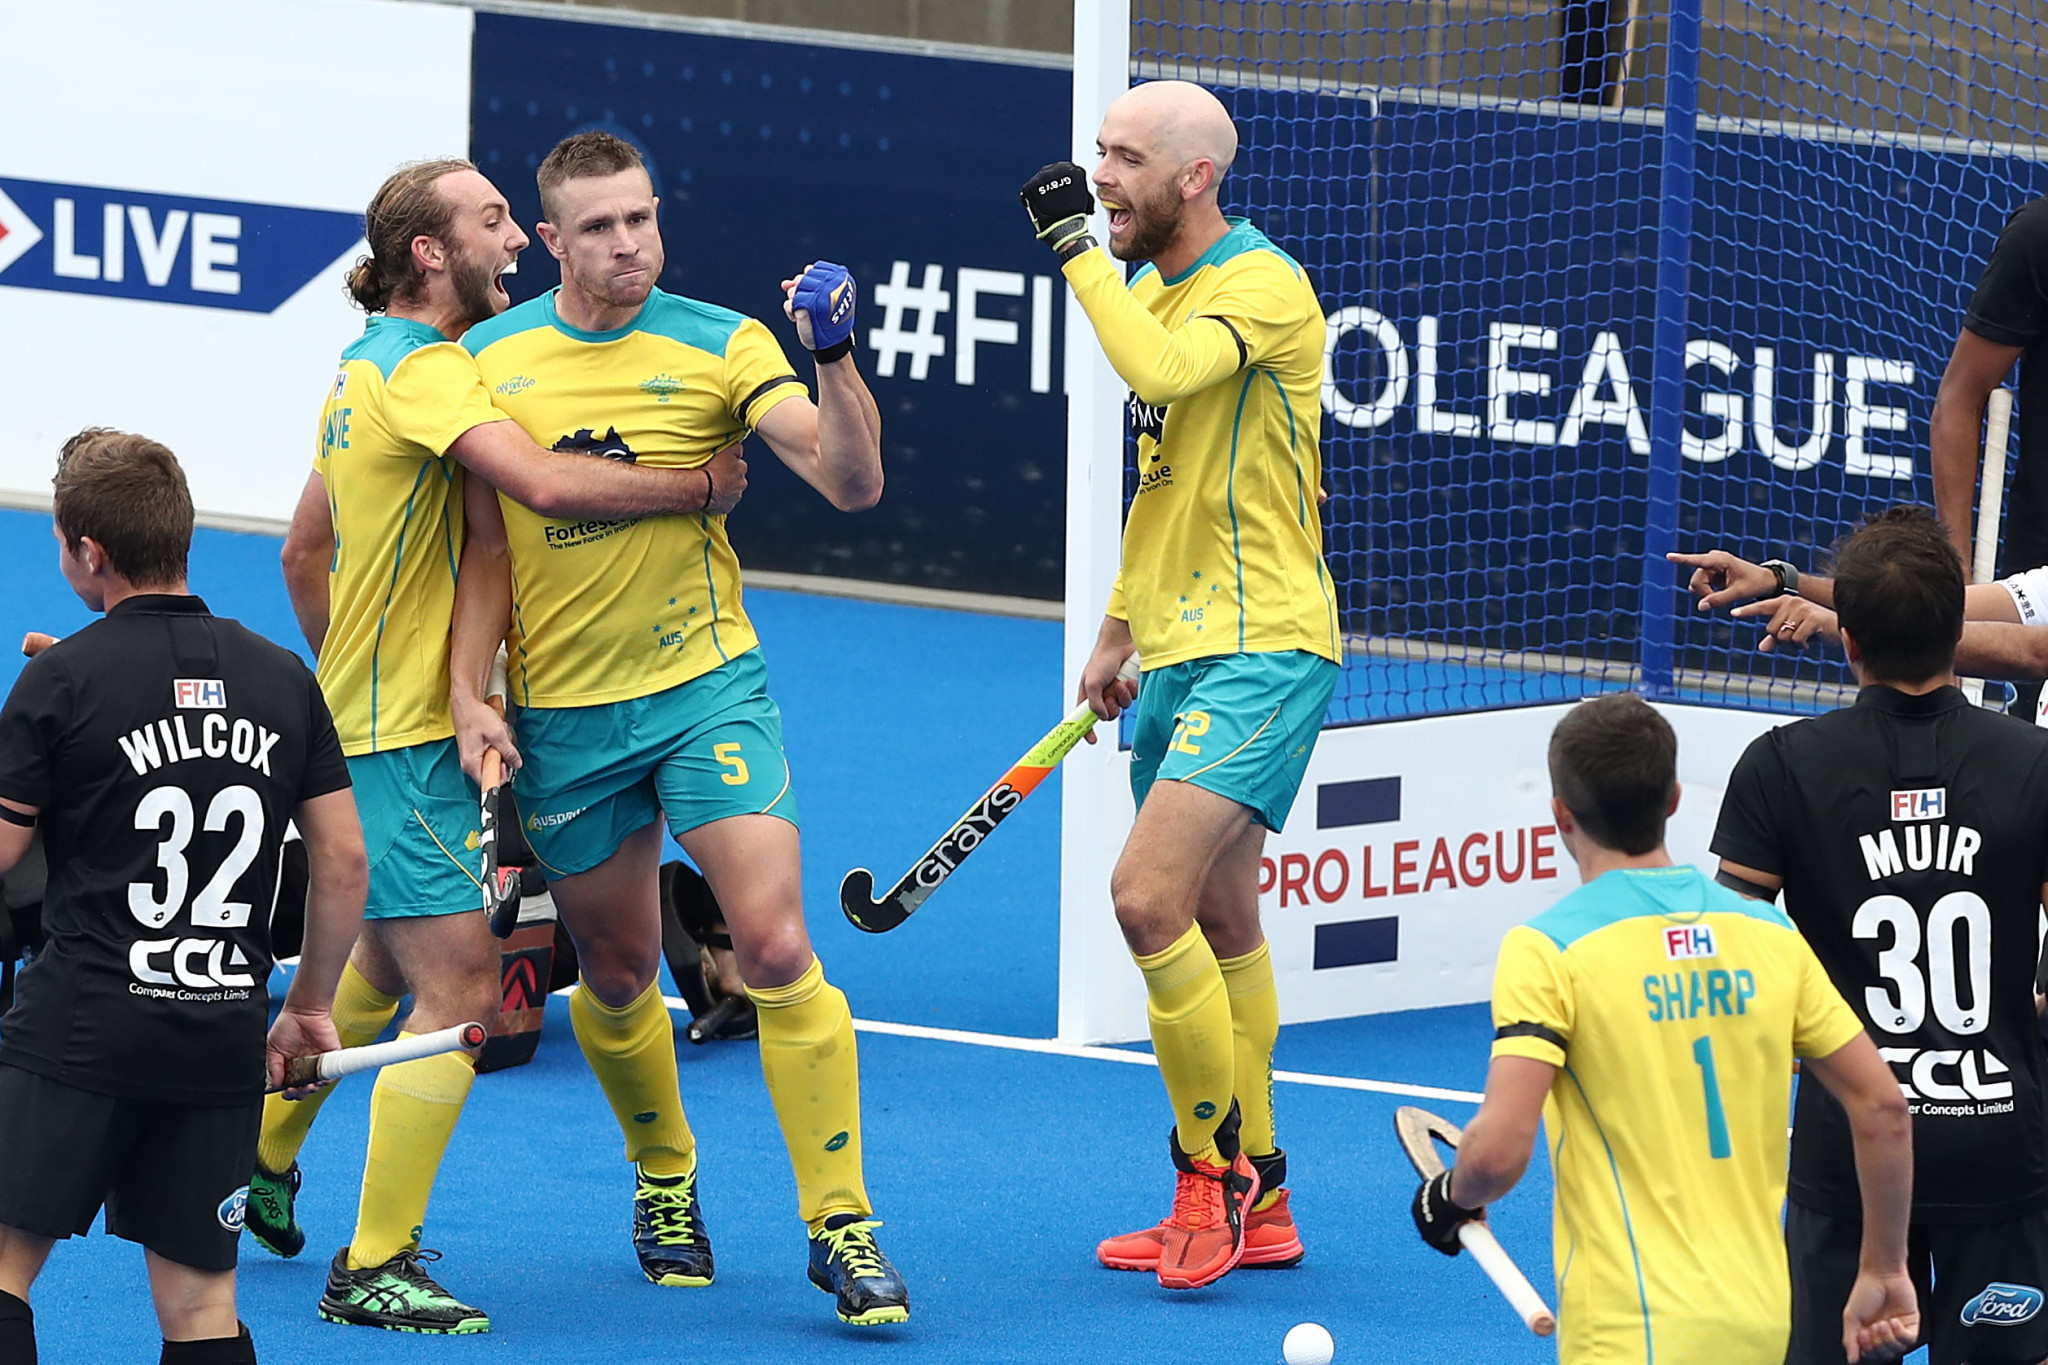 Australia's men win again but women lose in FIH Pro League New Zealand face off